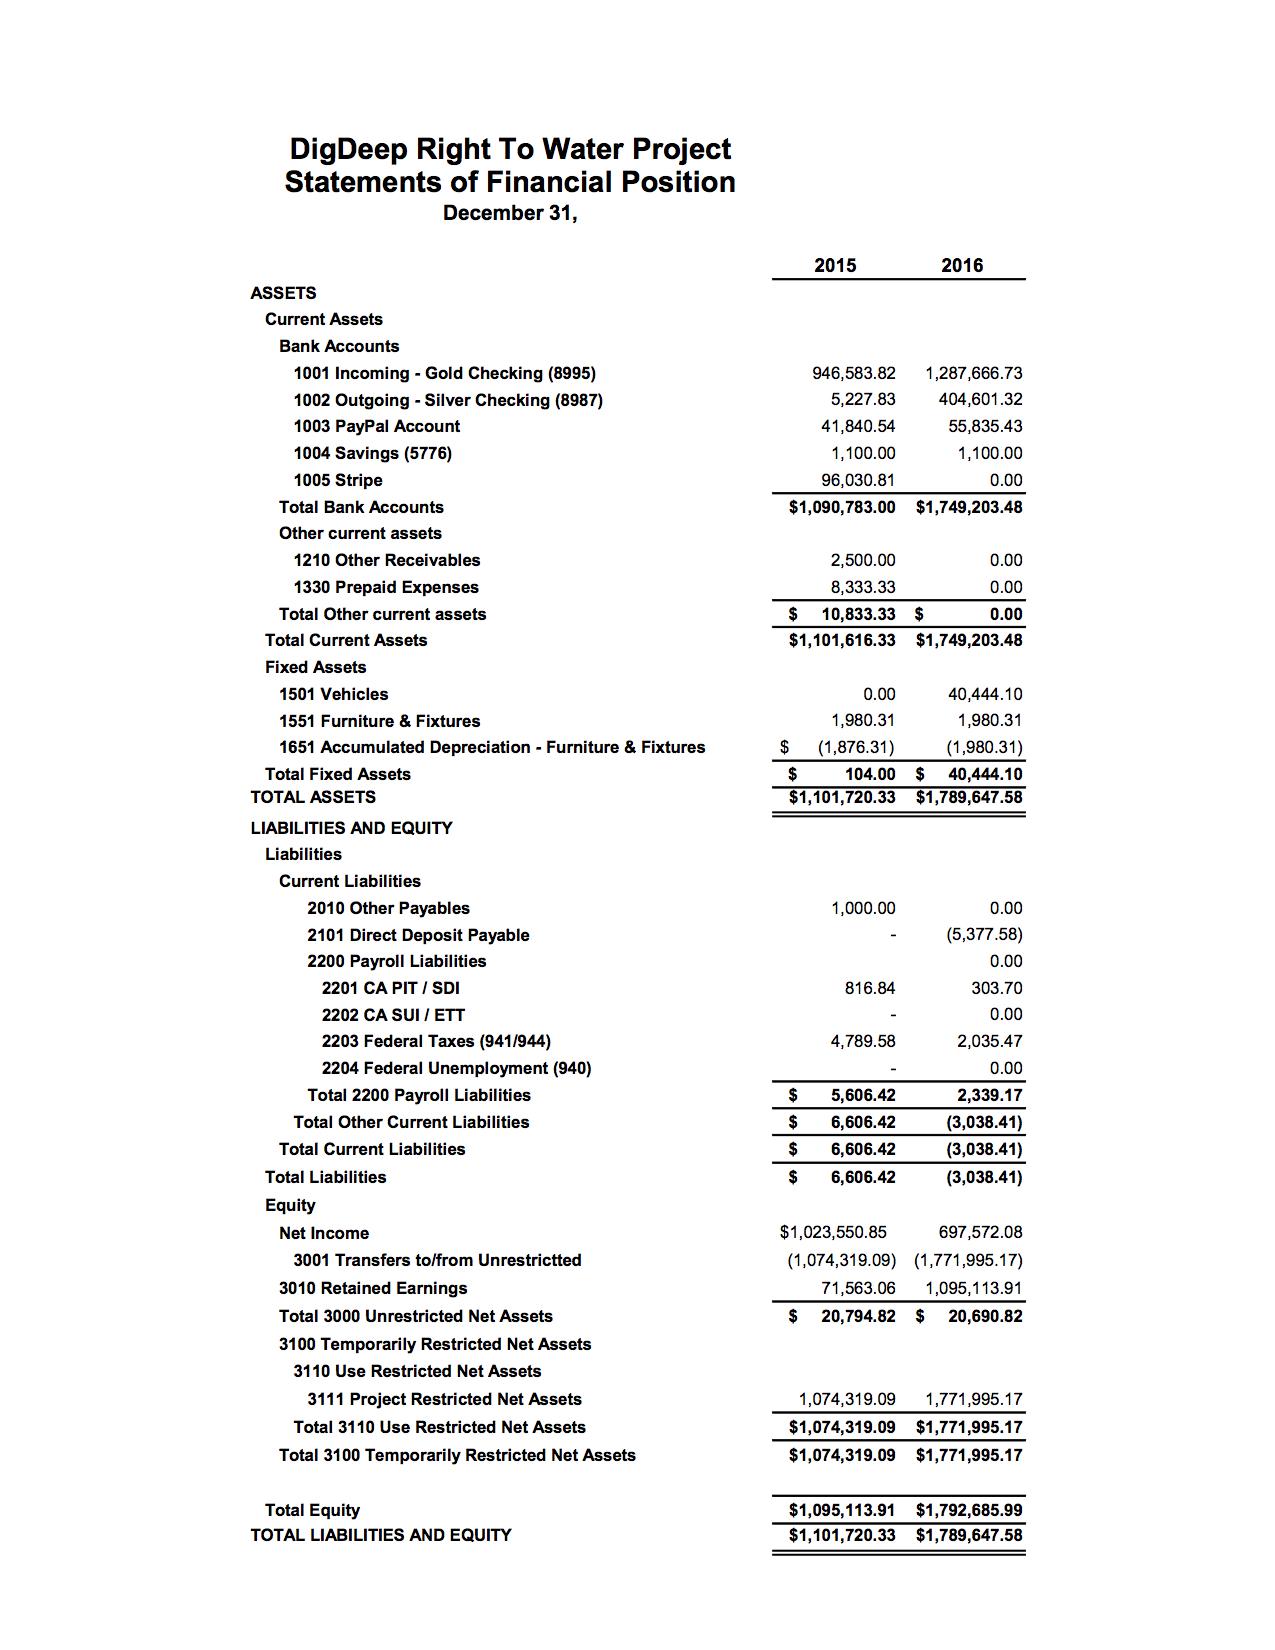 2016 Financial Statements DDRWP 2016 0320.xlsx (dragged) 1.jpg